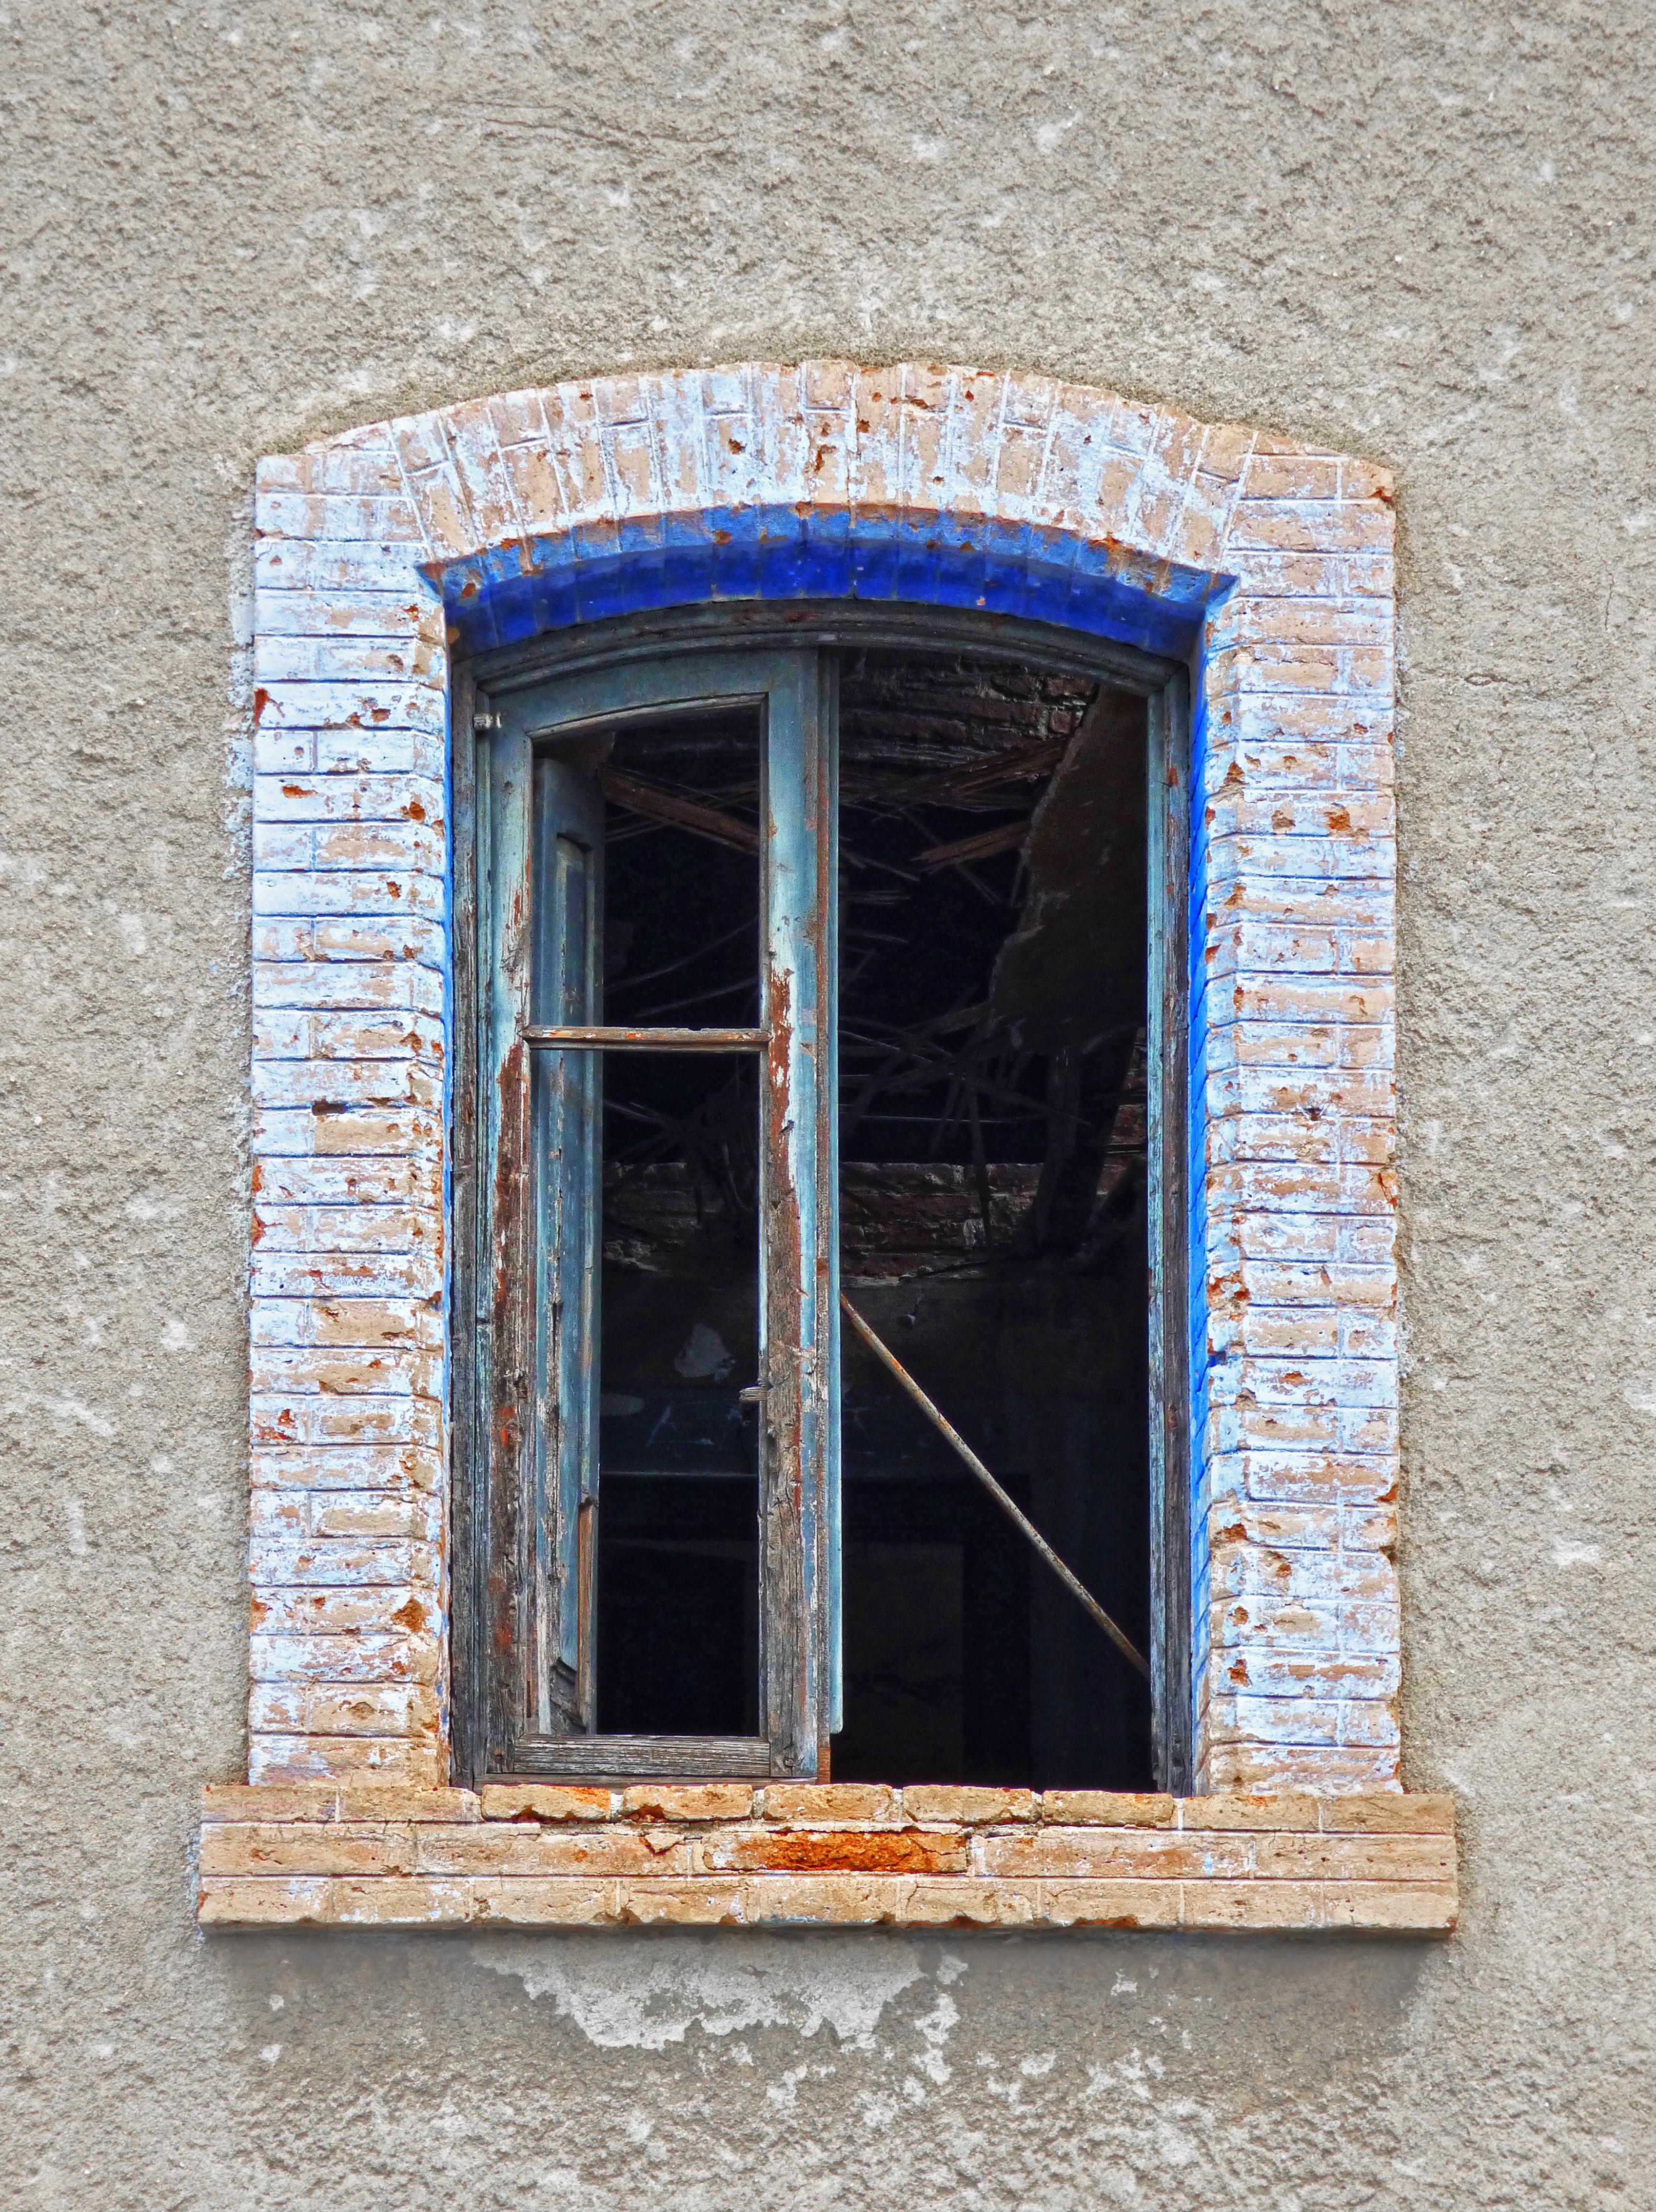 Fotos gratis : arquitectura, madera, casa, antiguo, pared, arco ...